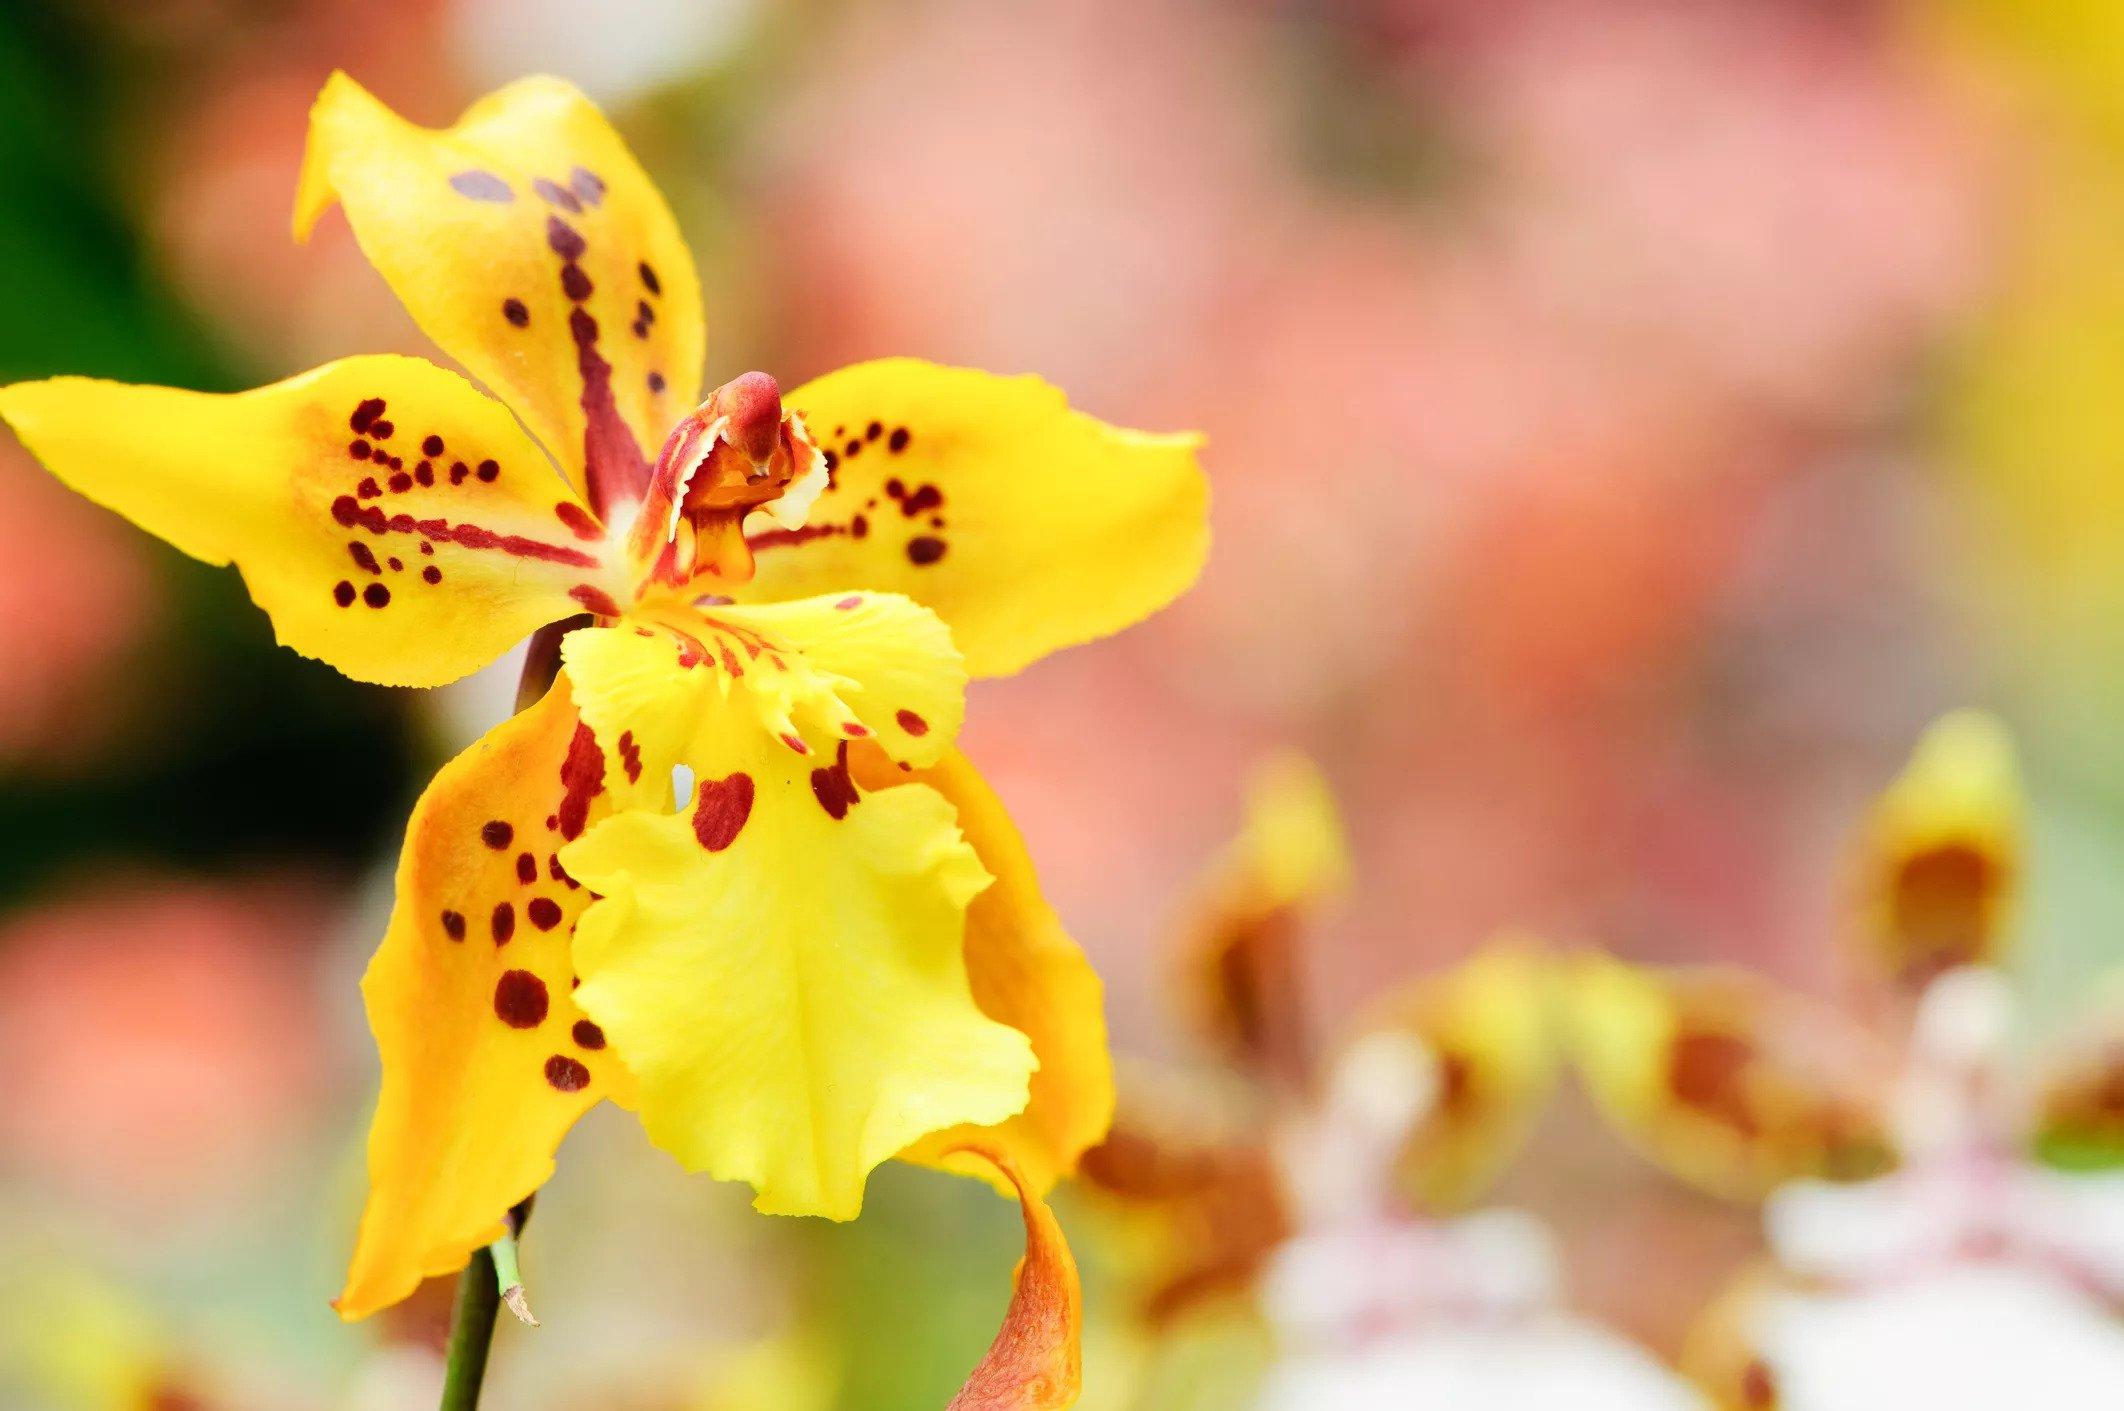 گل ارکیده Oncidium Orchids